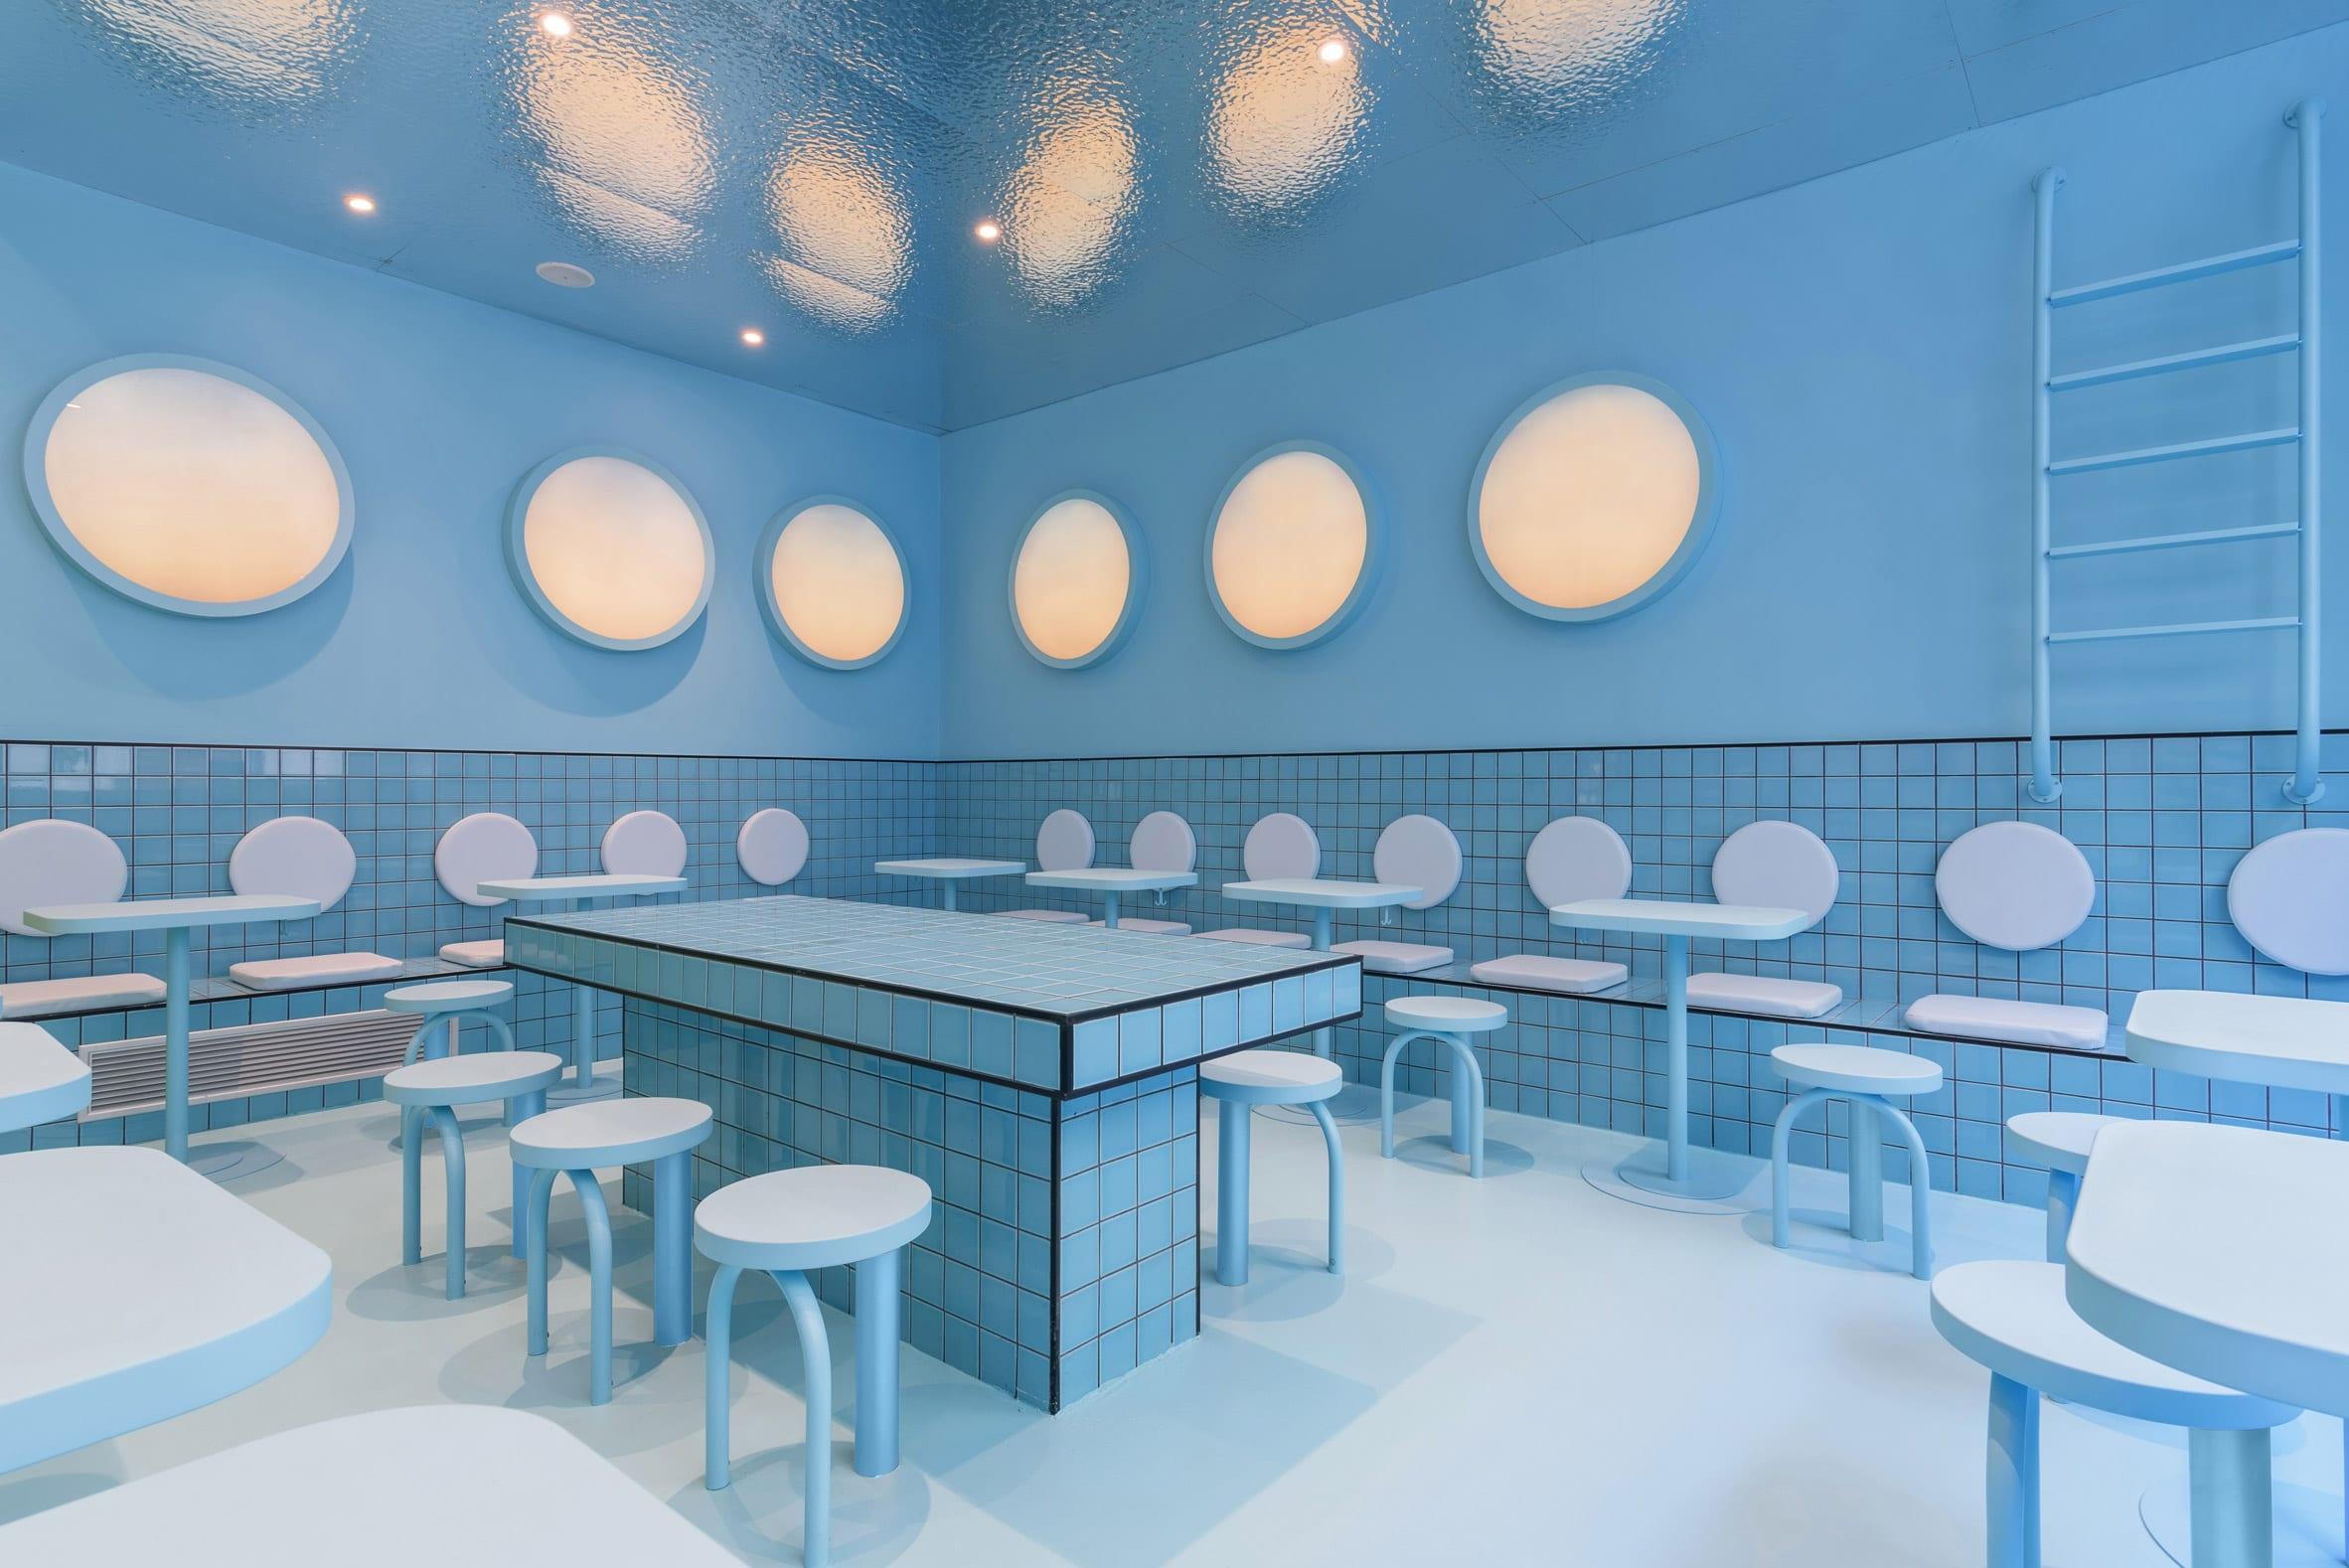 Masquespacio designed a swimming pool seating area